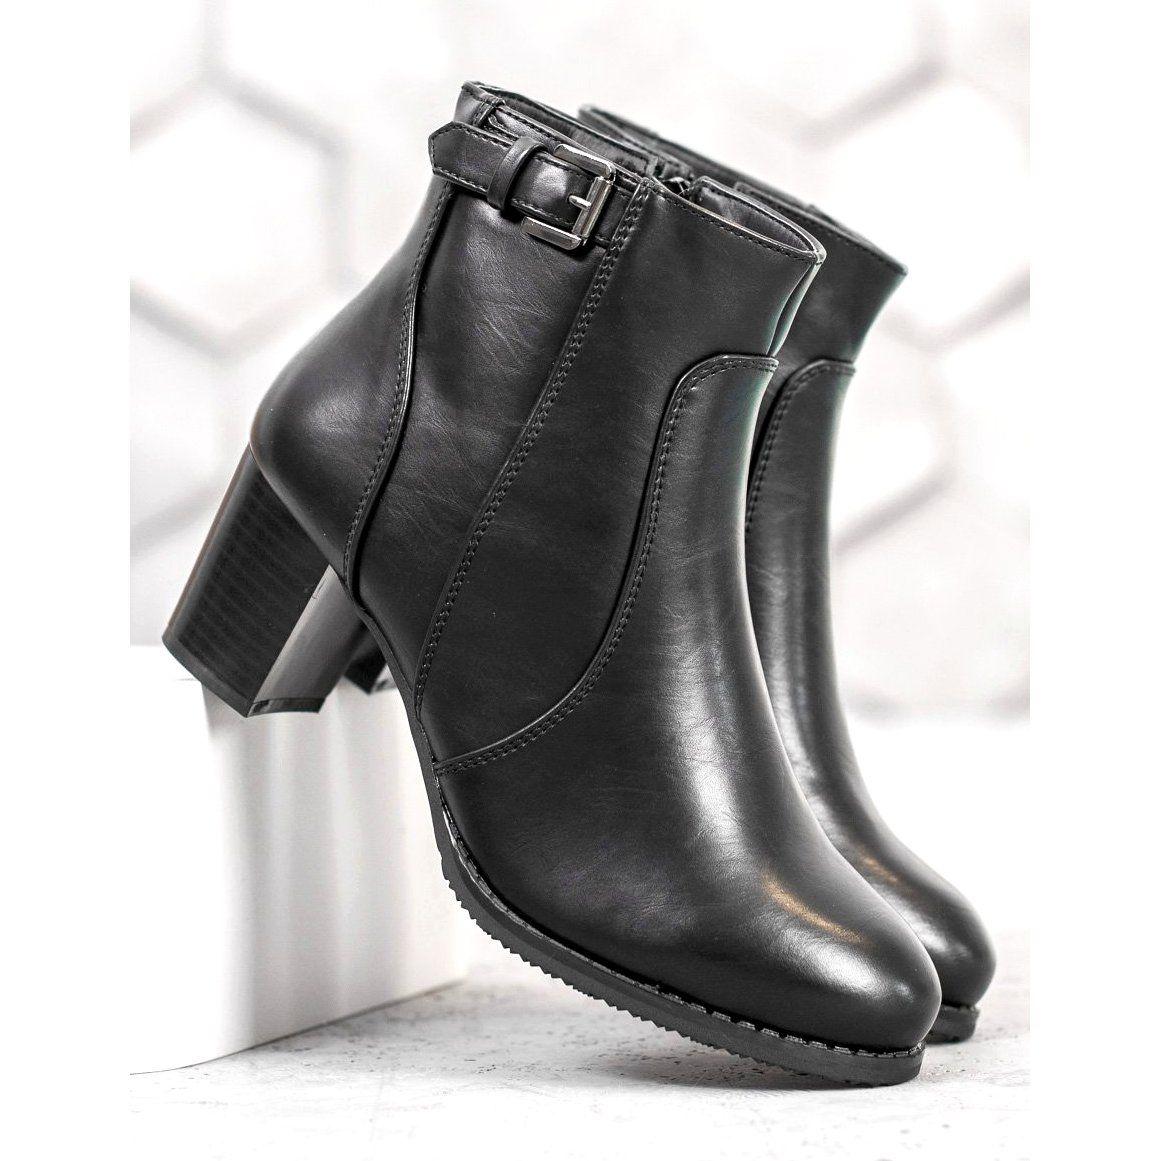 J Star Klasyczne Botki Na Obcasie Czarne Elegant Boots Black High Heels Black Heels